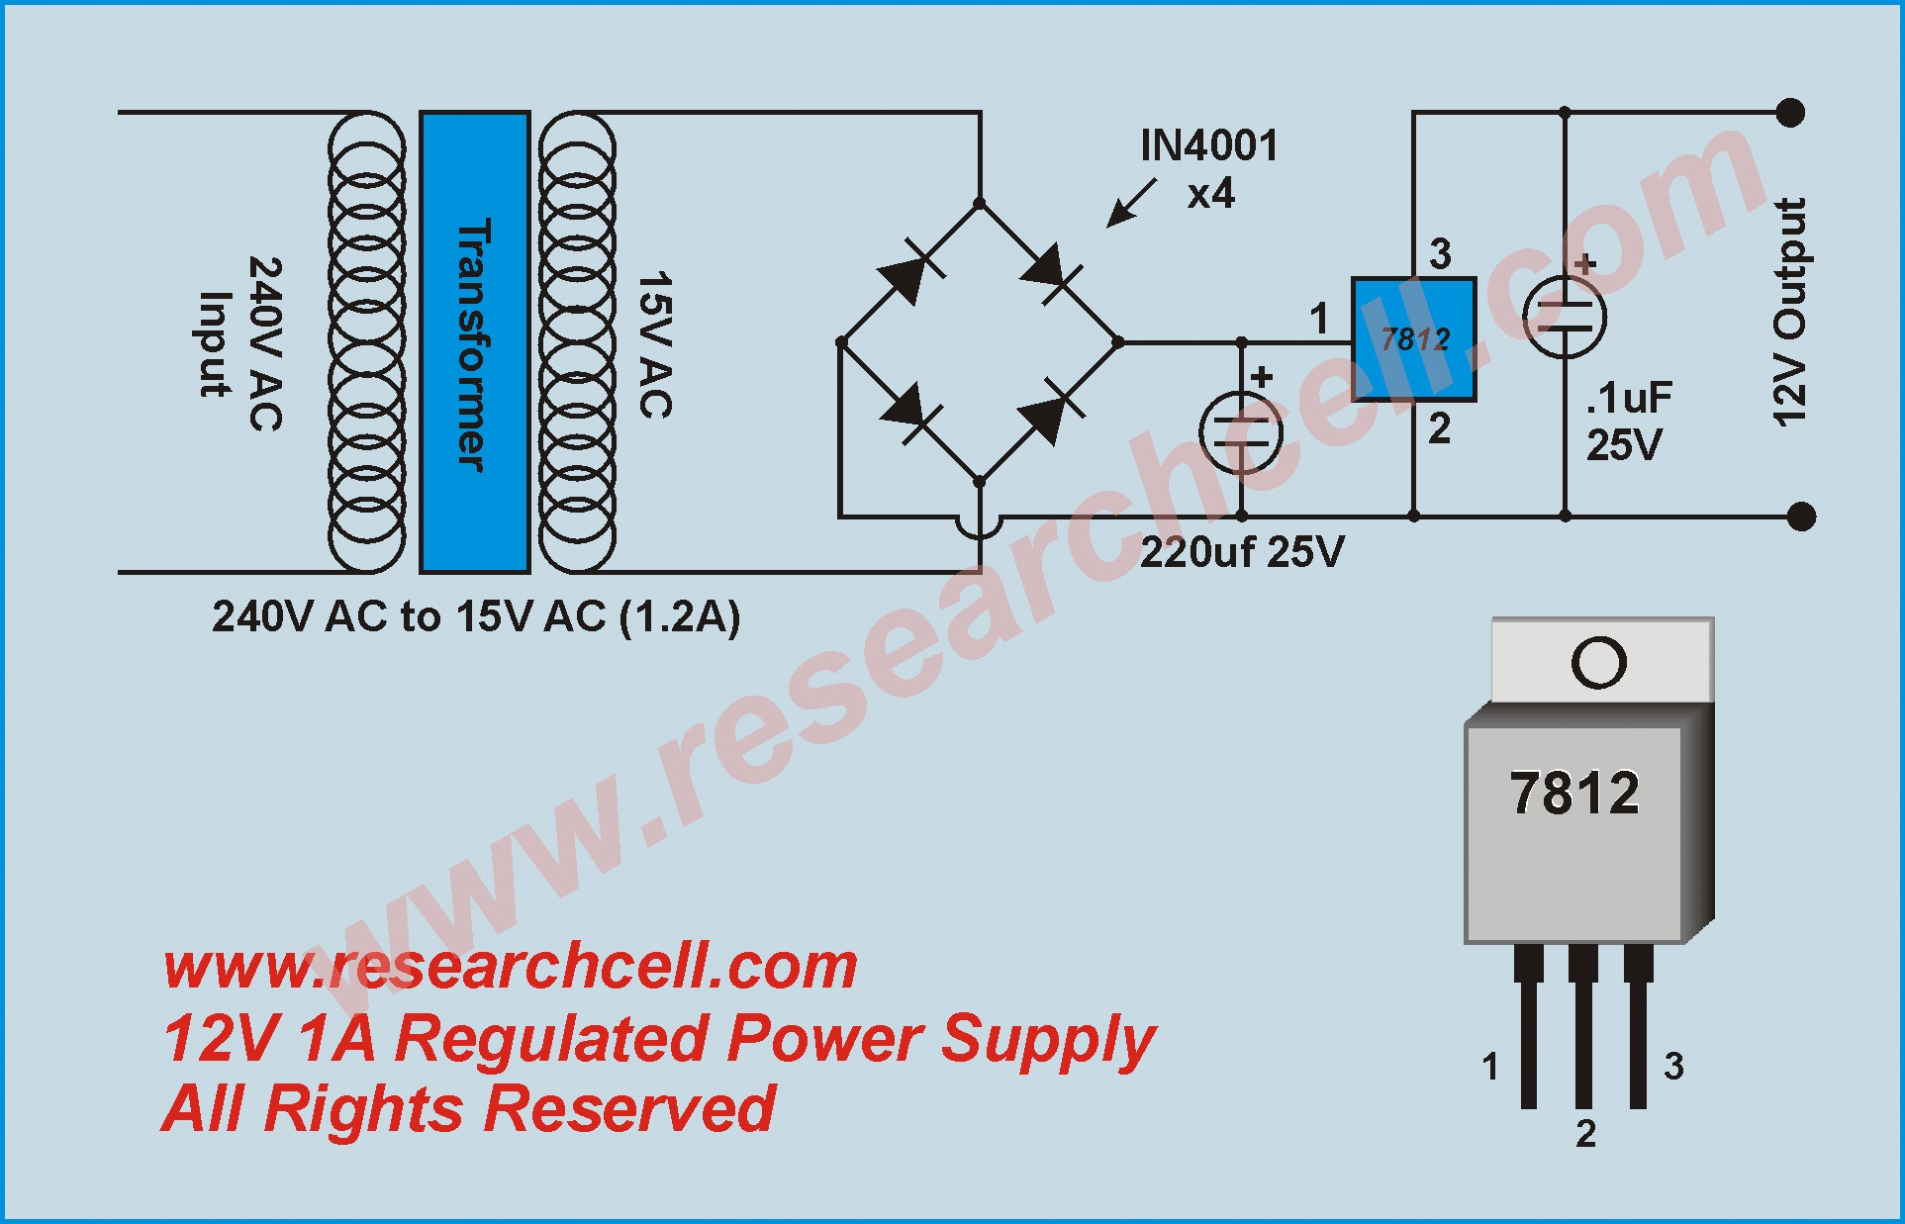 Wiring Diagram Car Voltage Regulator Inspirationa 12 Volt Generator - 12 Volt Generator Voltage Regulator Wiring Diagram